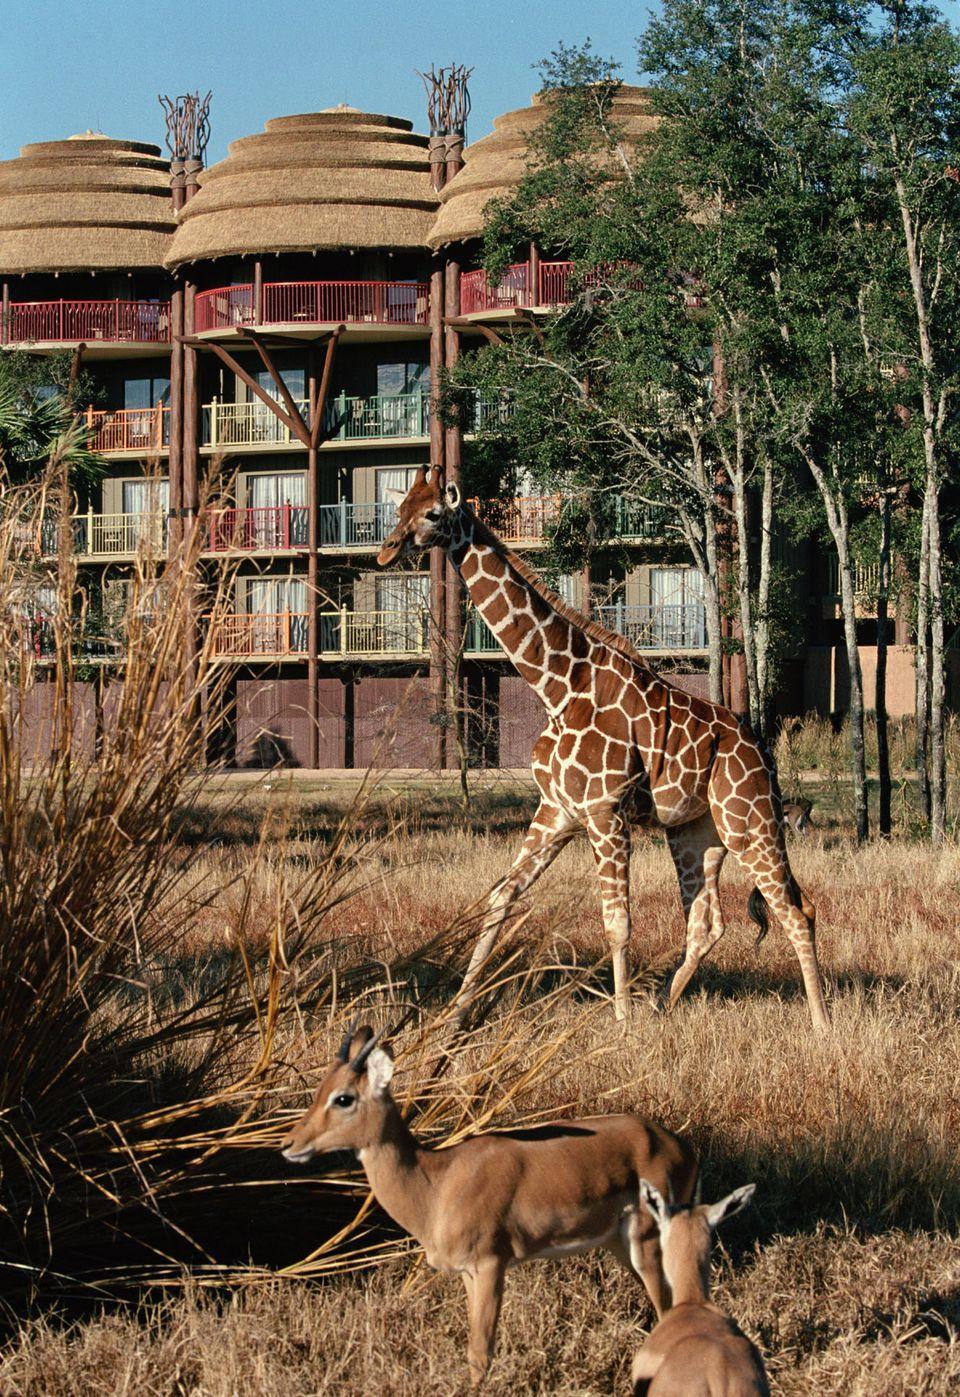 Giraffe and other exotic animals roaming savanah at Disney's Animal Kingdom Lodge.